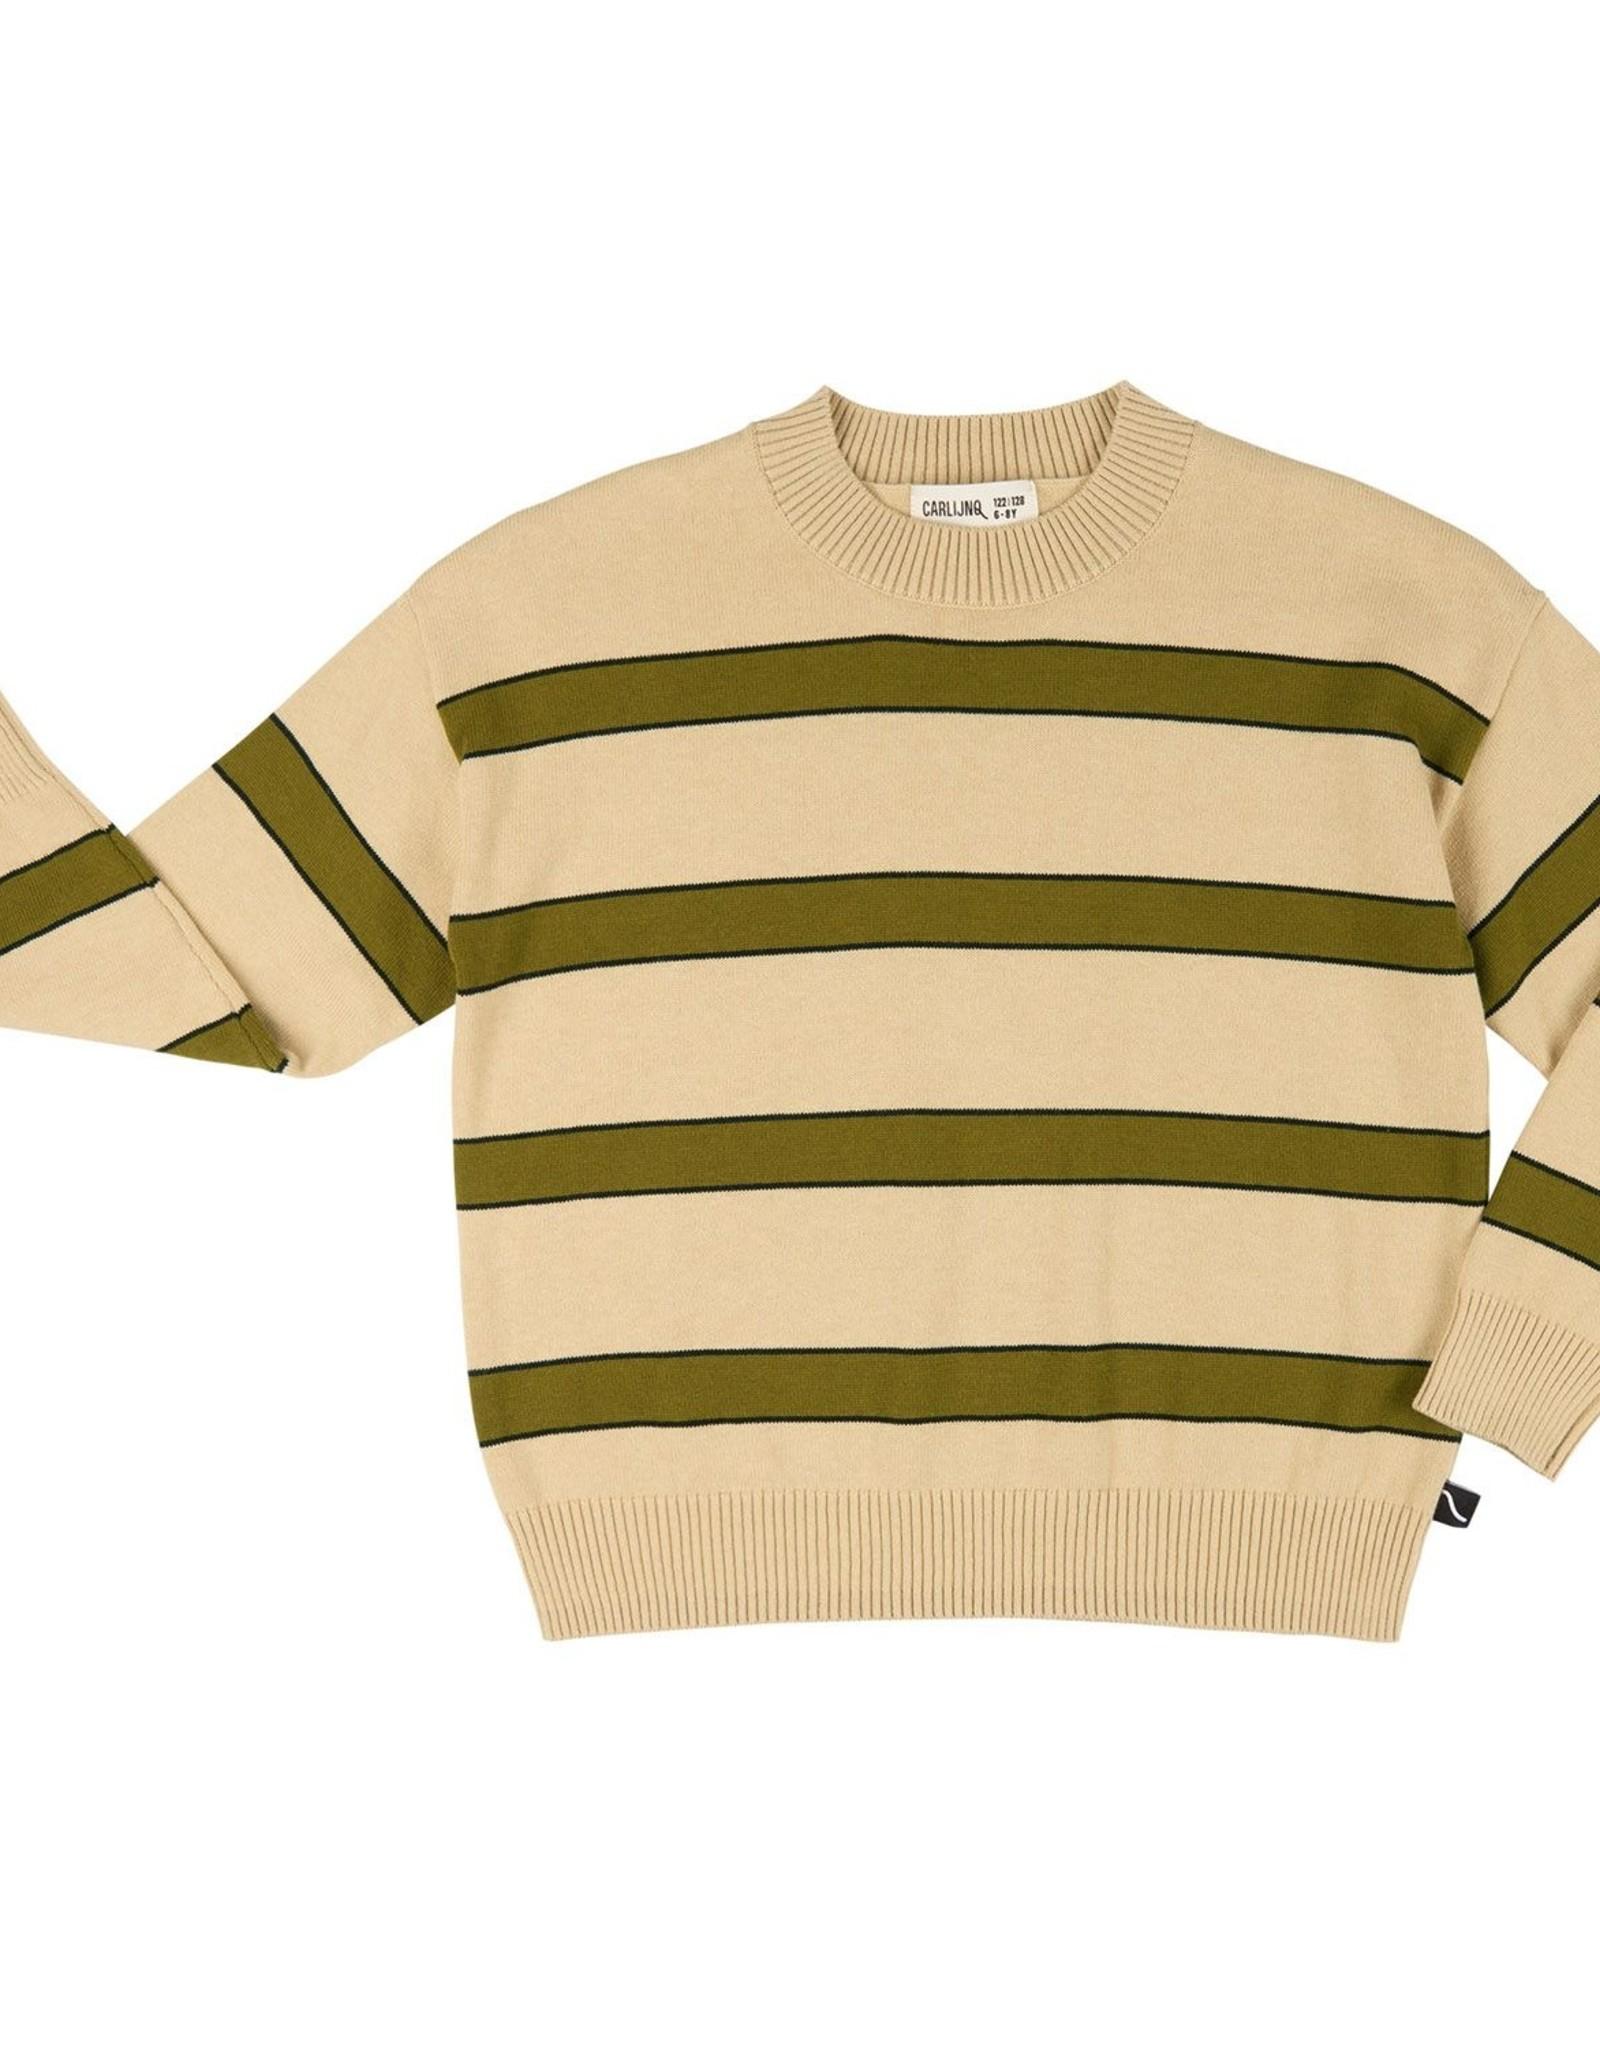 CarlijnQ CarlijnQ Basic knits - sweater stripes